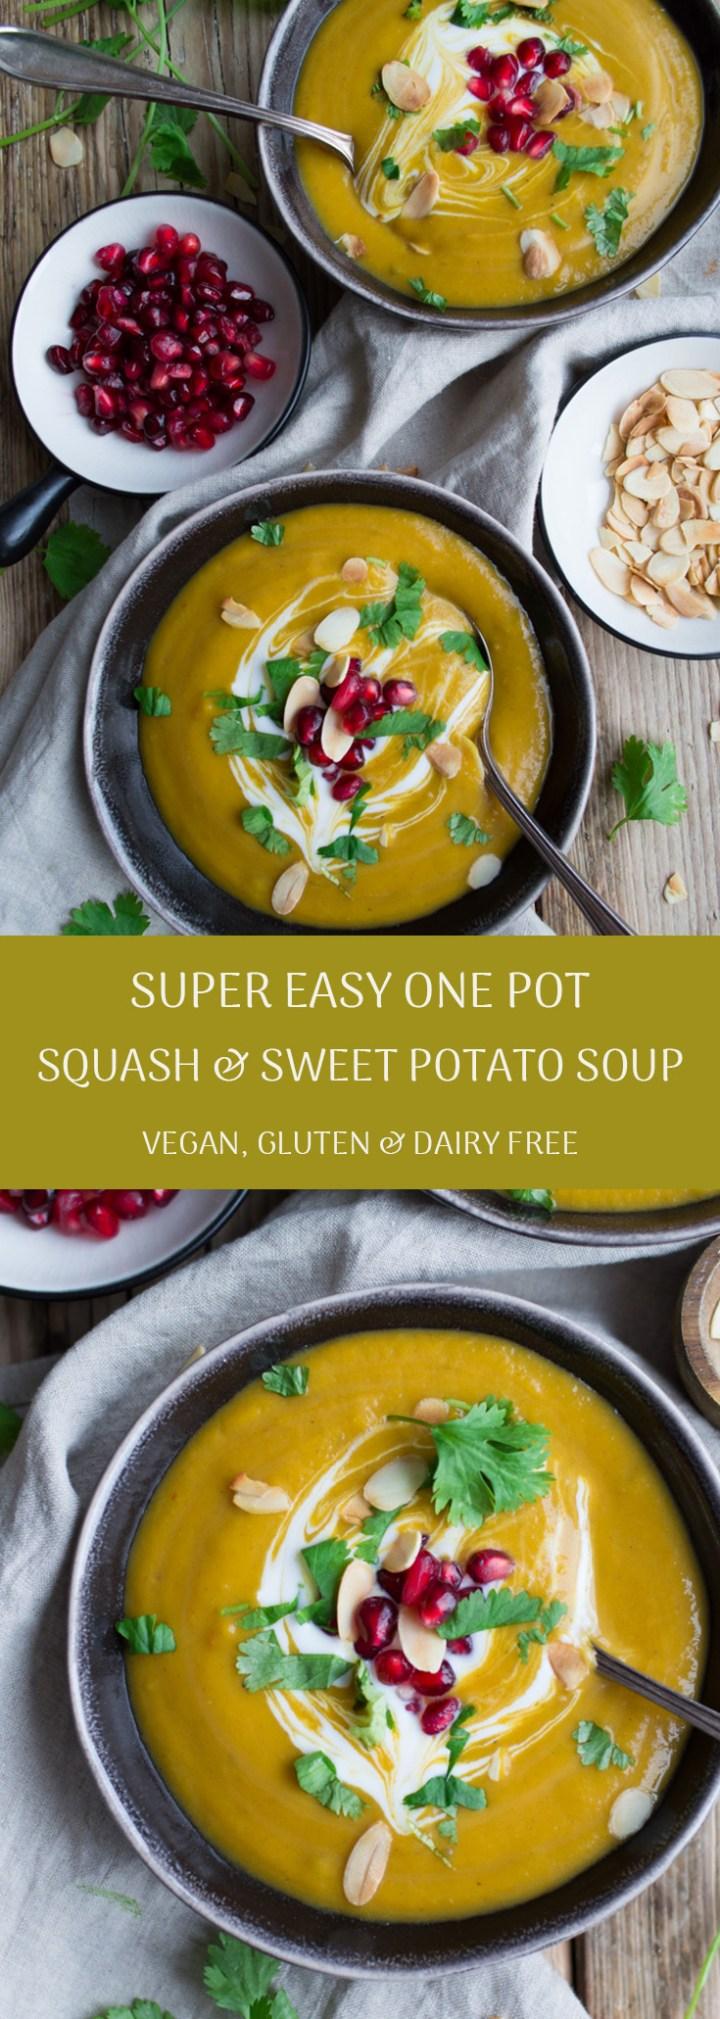 Sweet potato & squash soup #glutenfree #dairyfree #vegan #healthy | via @fit.foodie.nutter